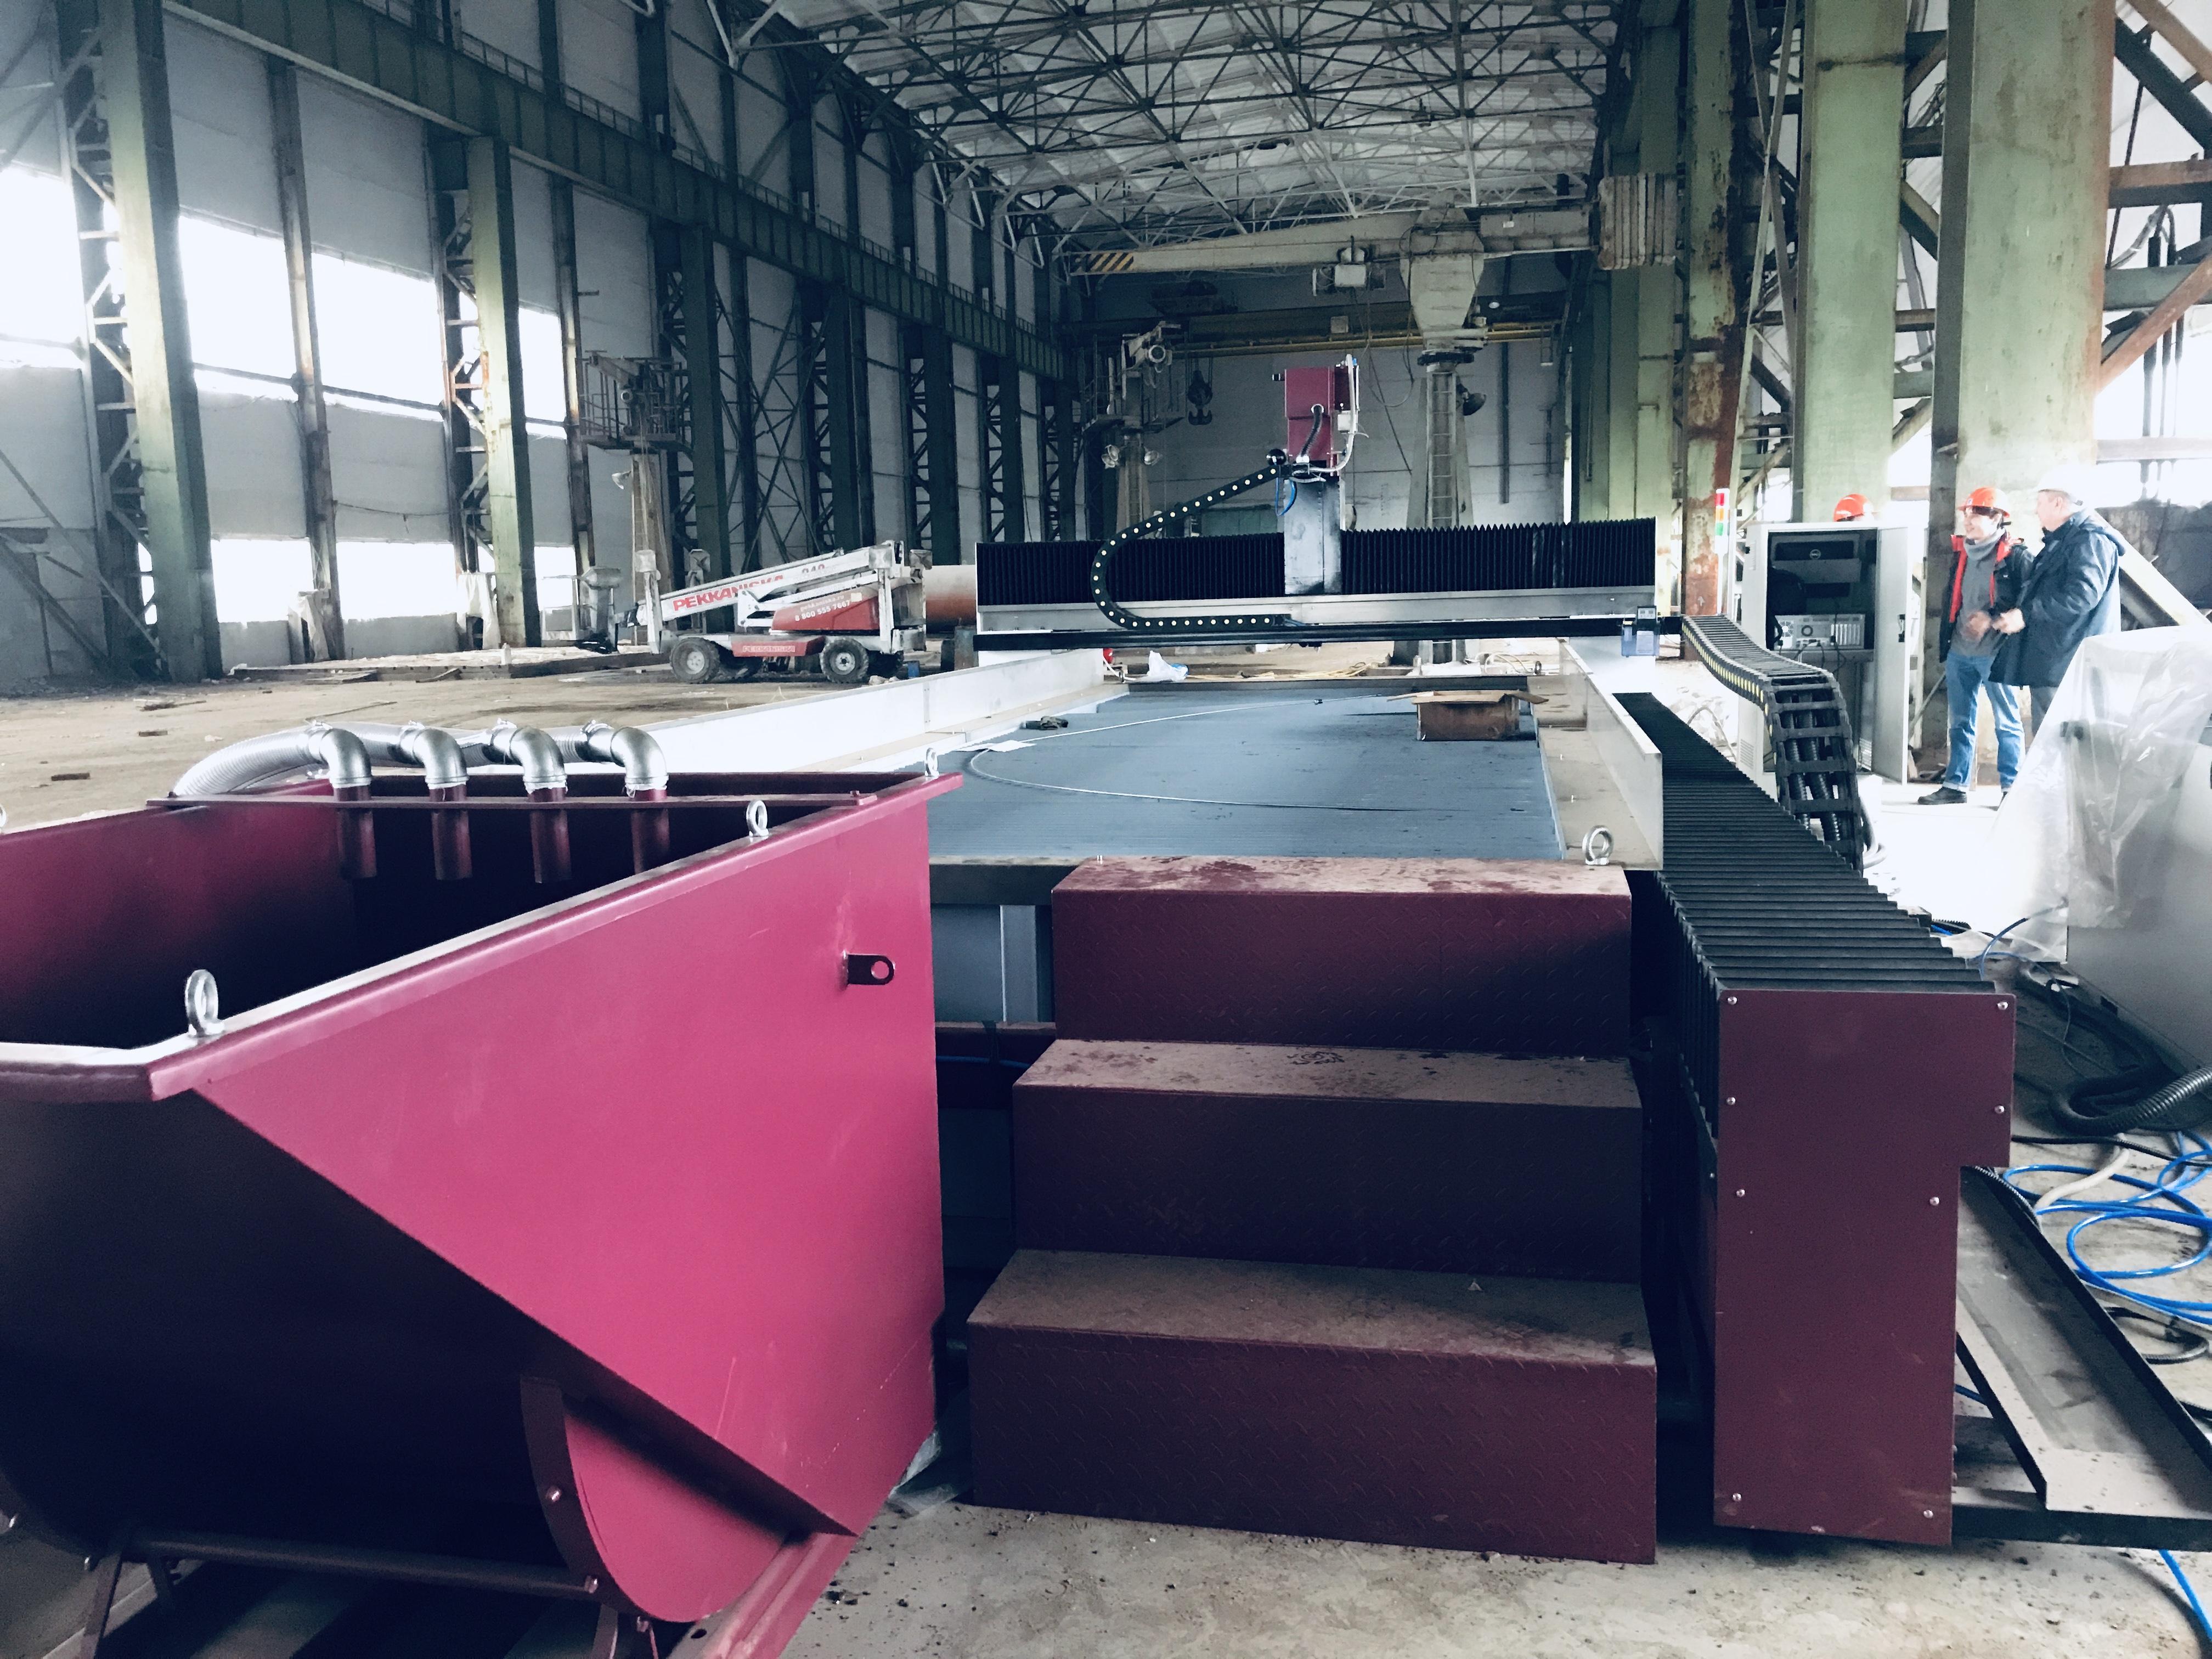 IMG 0111 - Поставка станка гидроабразивной резки для производства ОАО «РУМО»